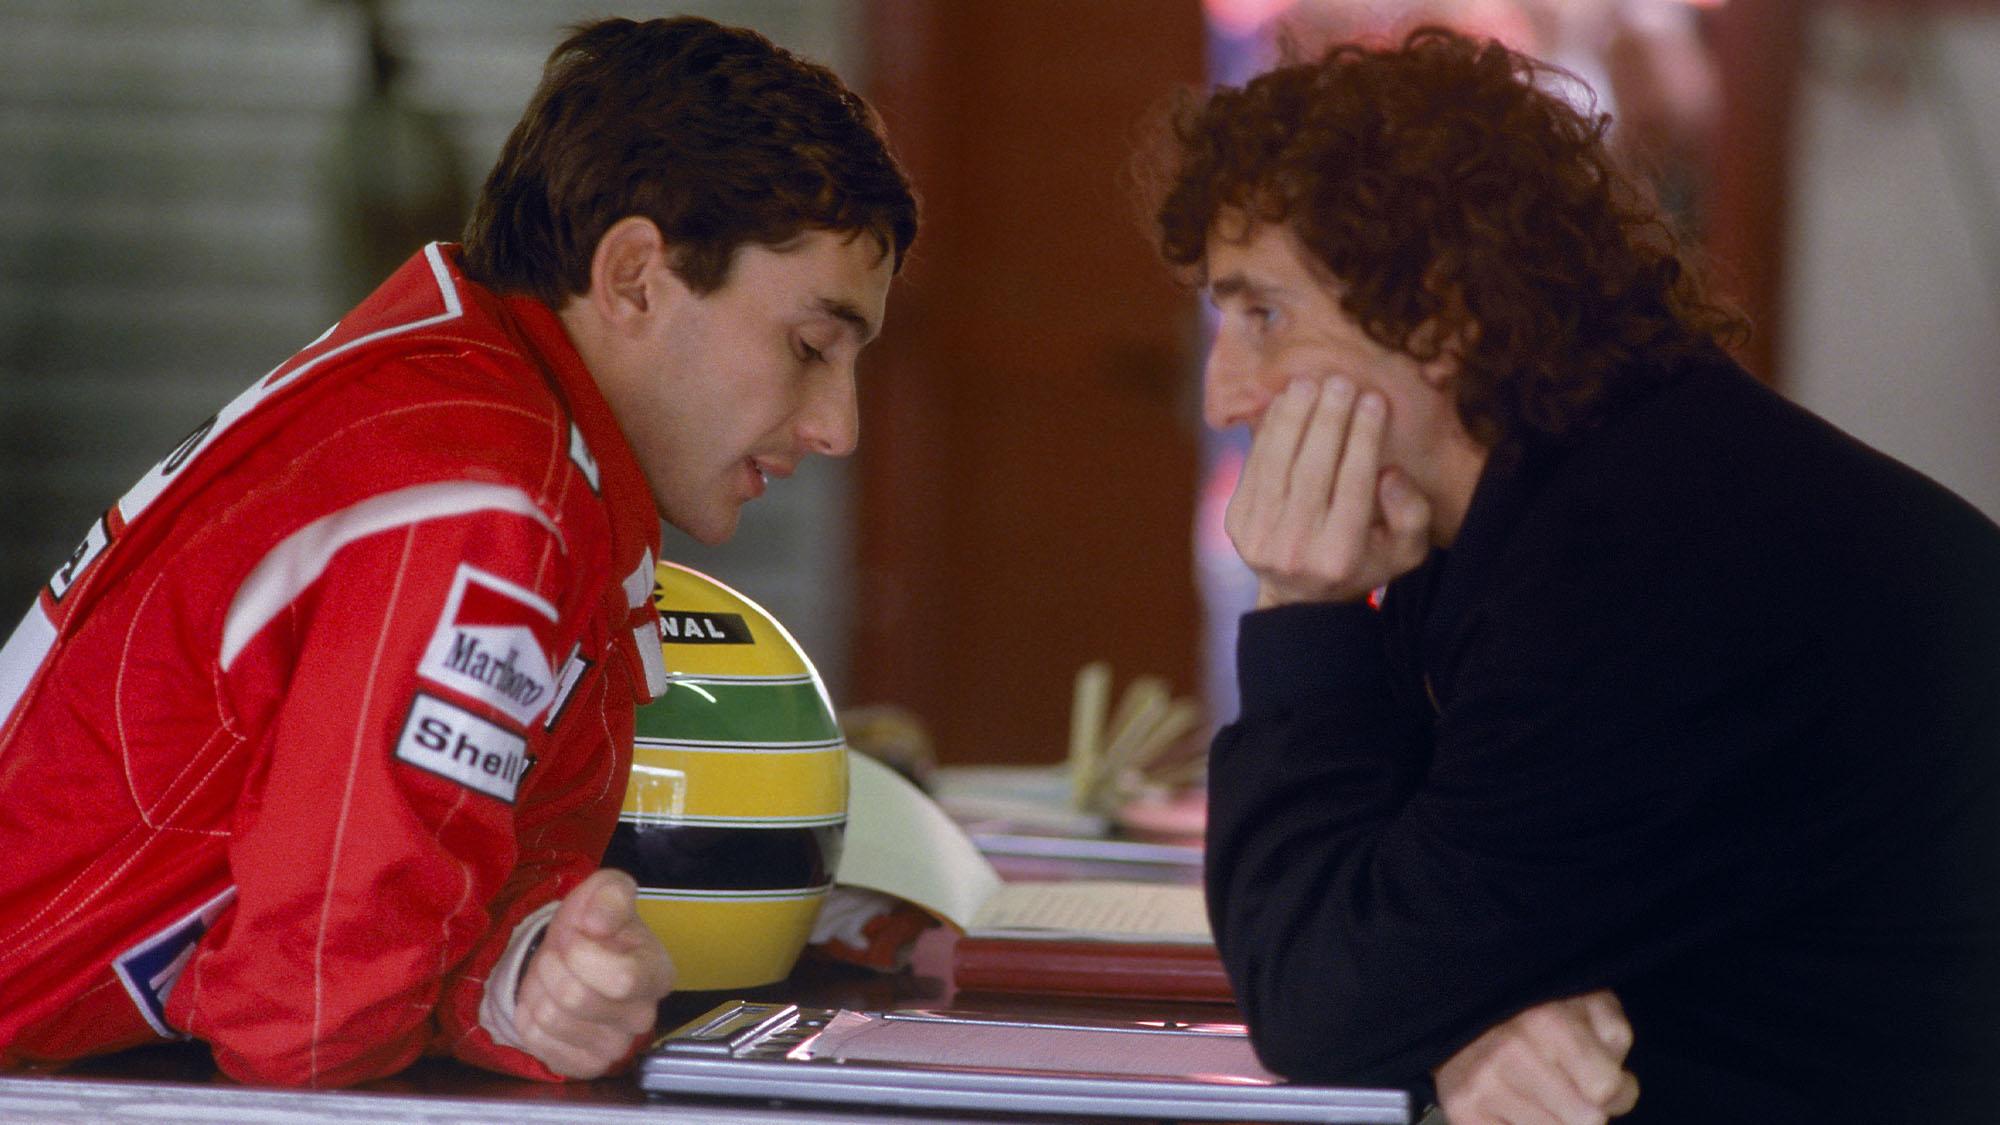 Senna Prost 88 talking